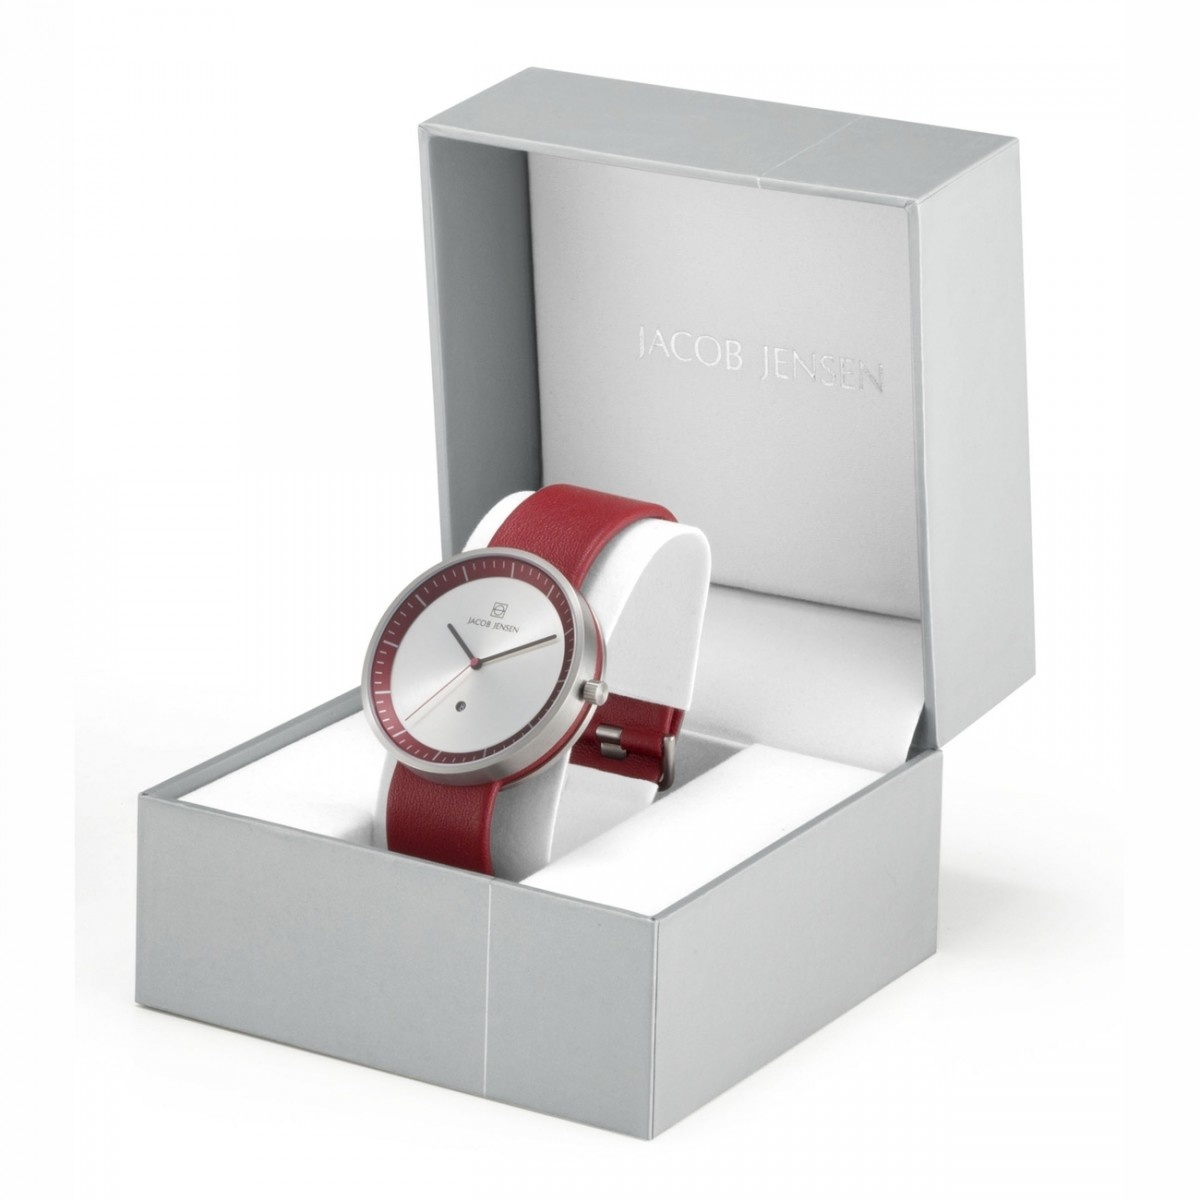 Jacob Jensen - Horloge Dames - Strata 283 - Rood-2